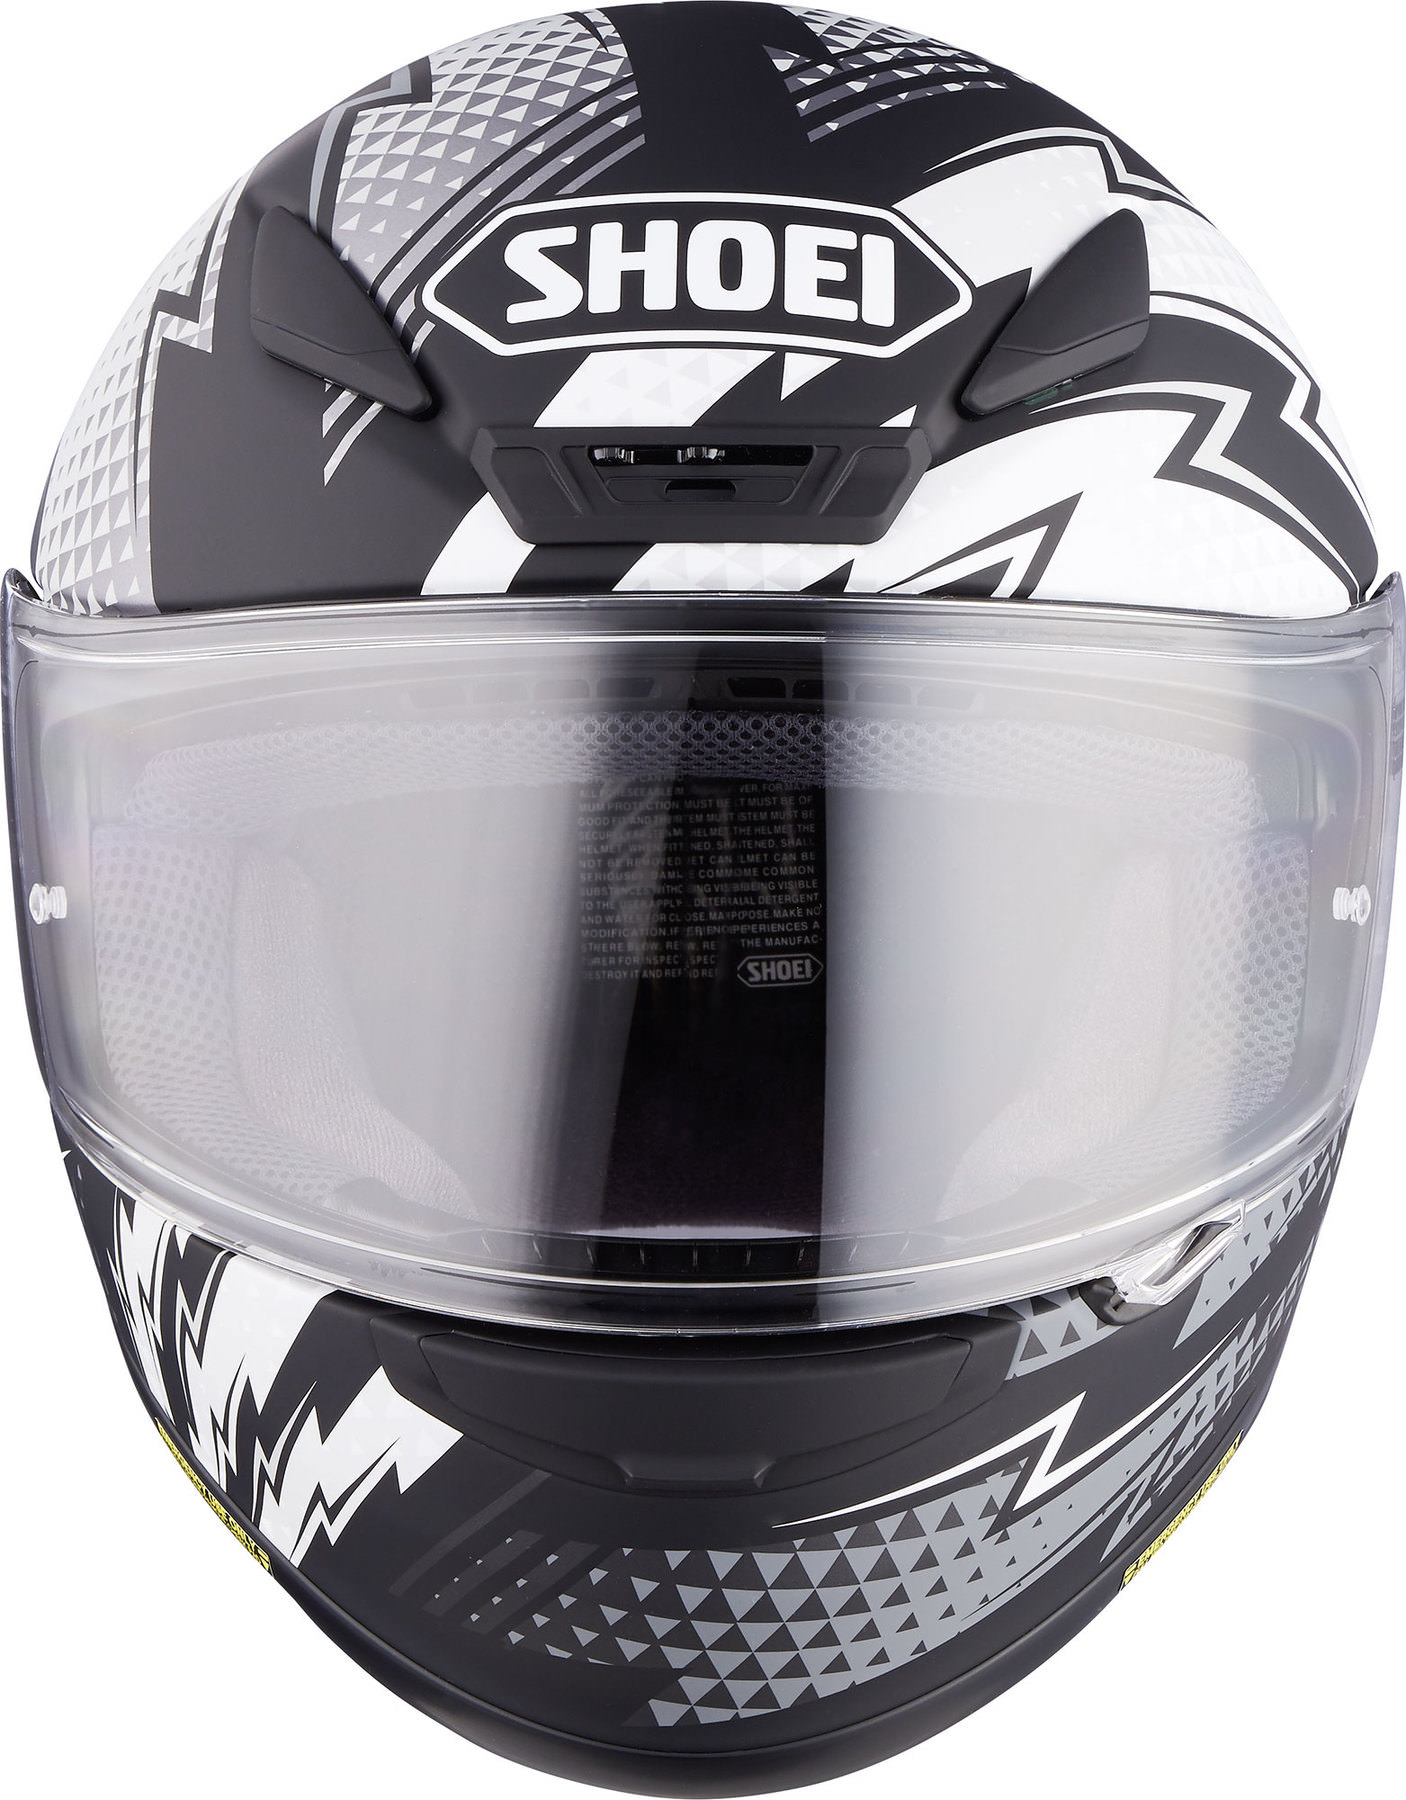 Capacete Shoei NXR Variable TC-5 Preto/Branco - Lançamento  - Planet Bike Shop Moto Acessórios